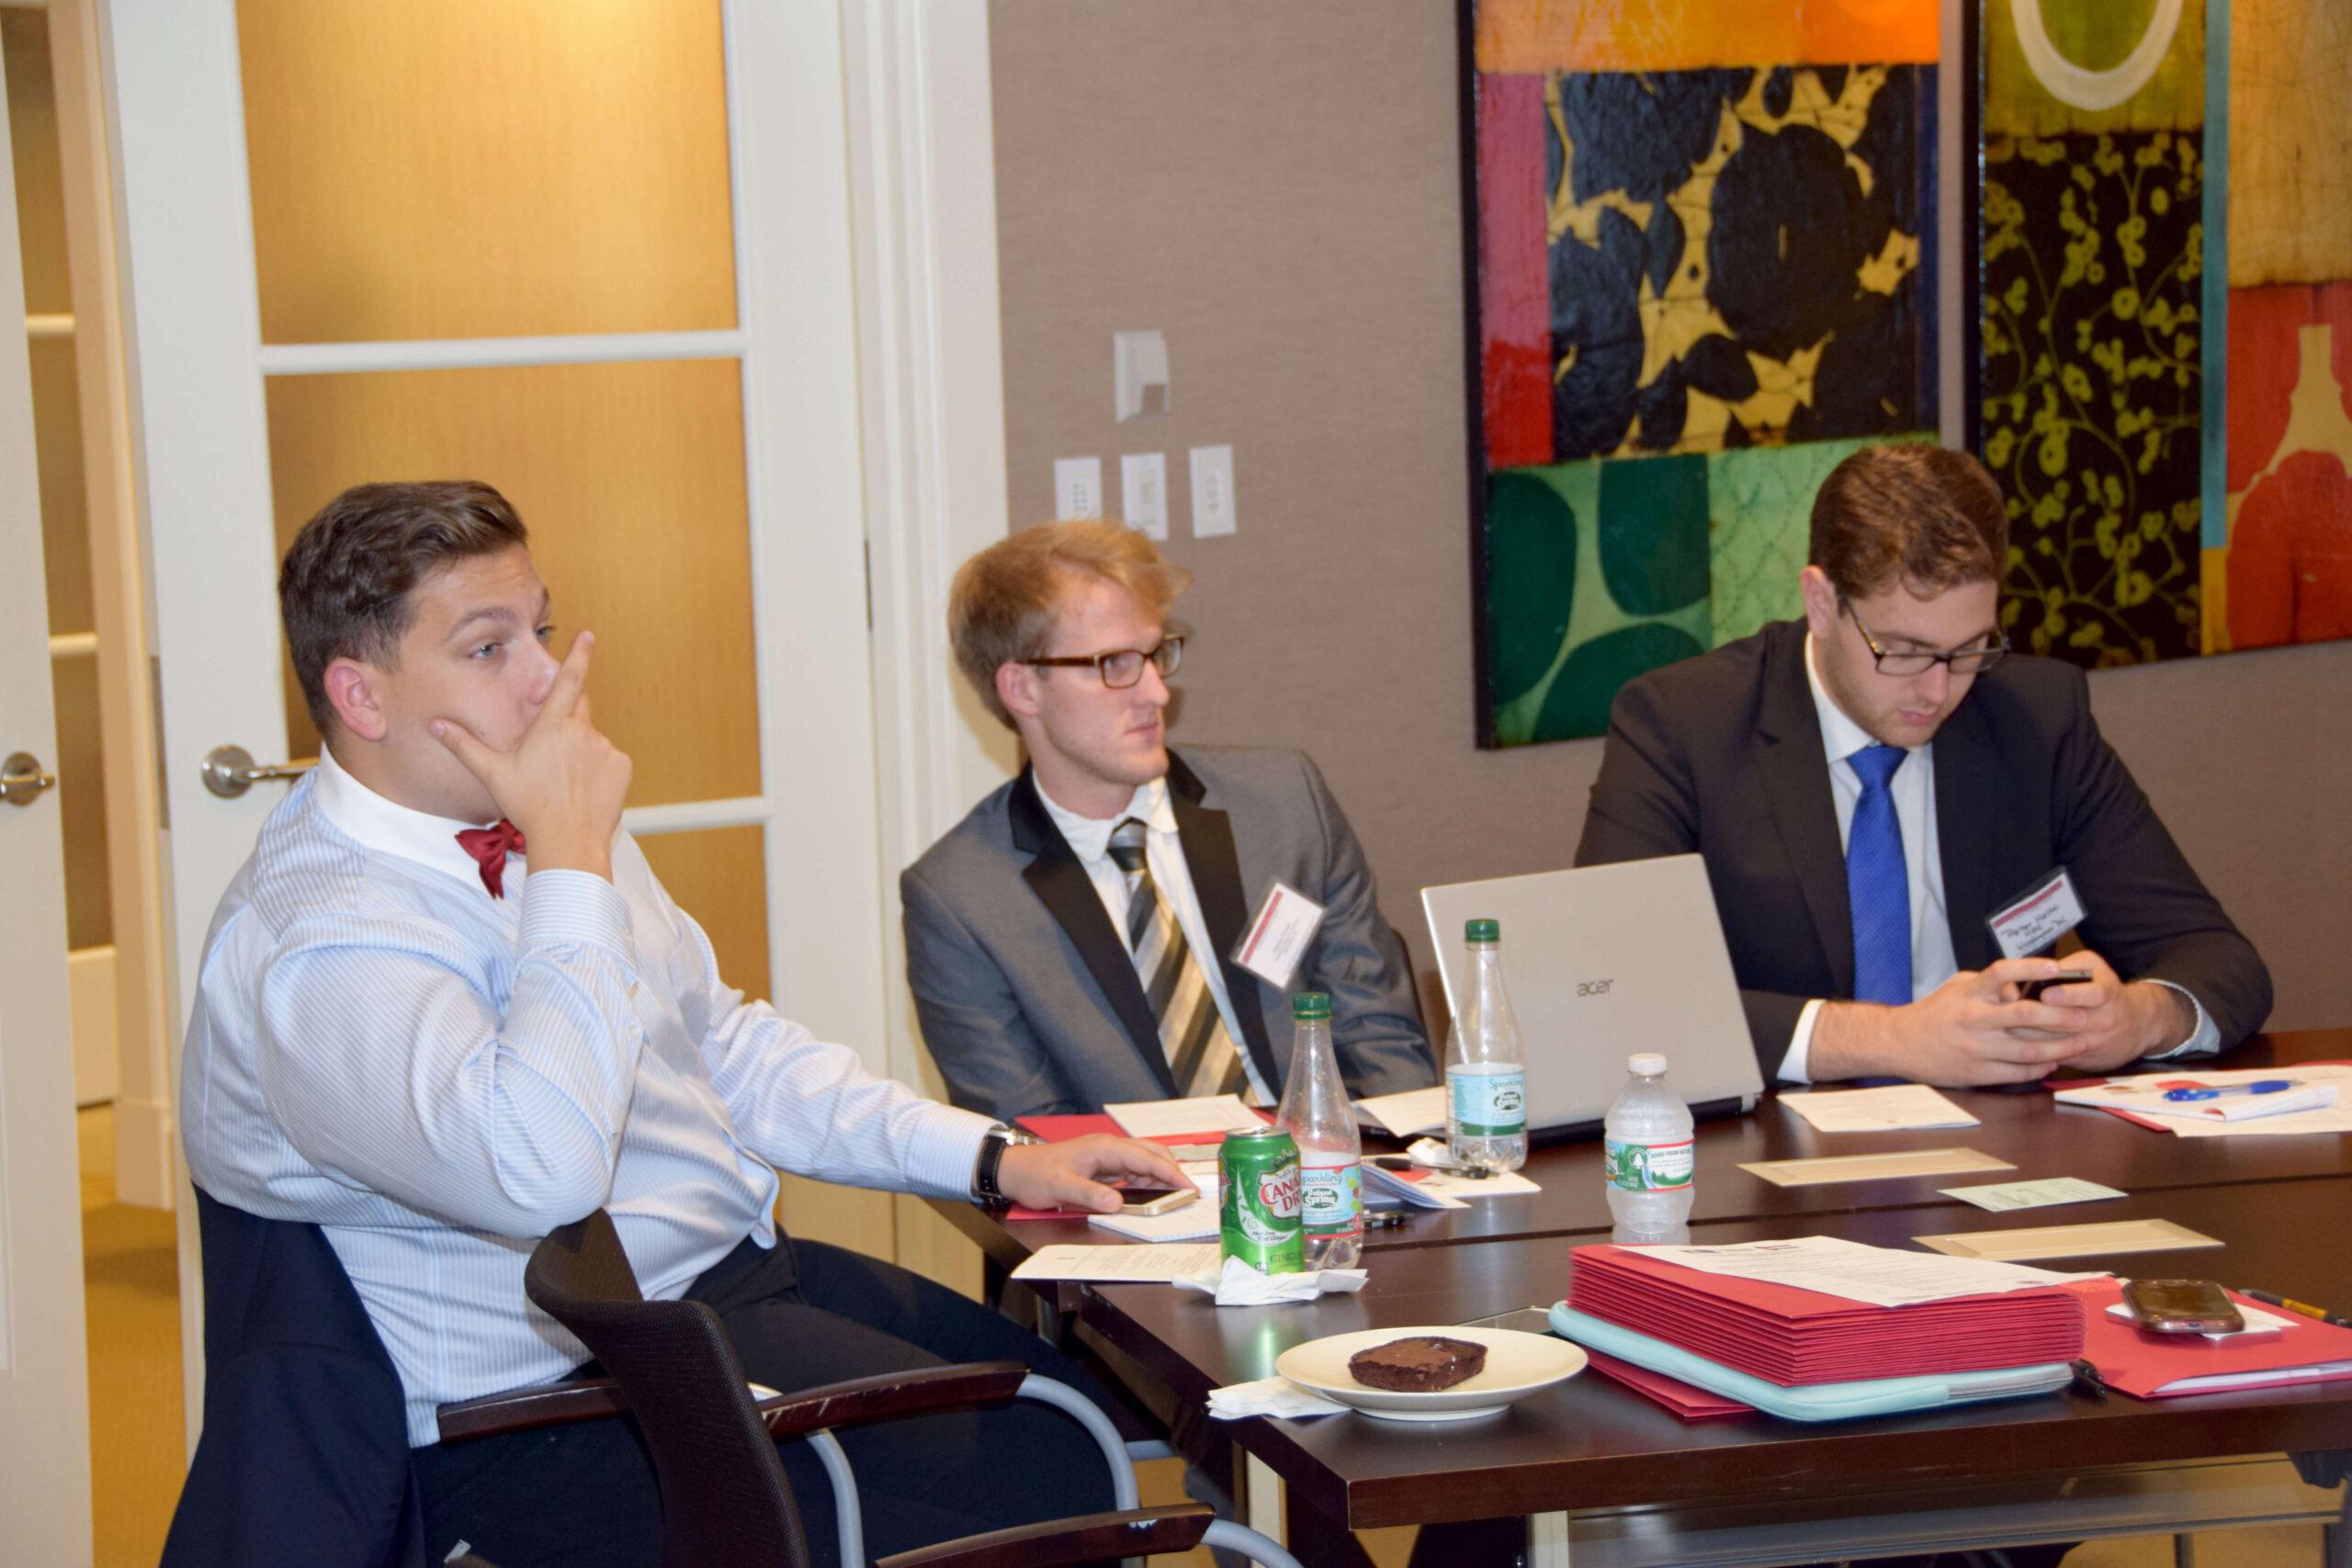 Congressional Internship Program interns Mr. Vince Berényi, Mr. Mátyás Tamási and Mr. Péter Heltai